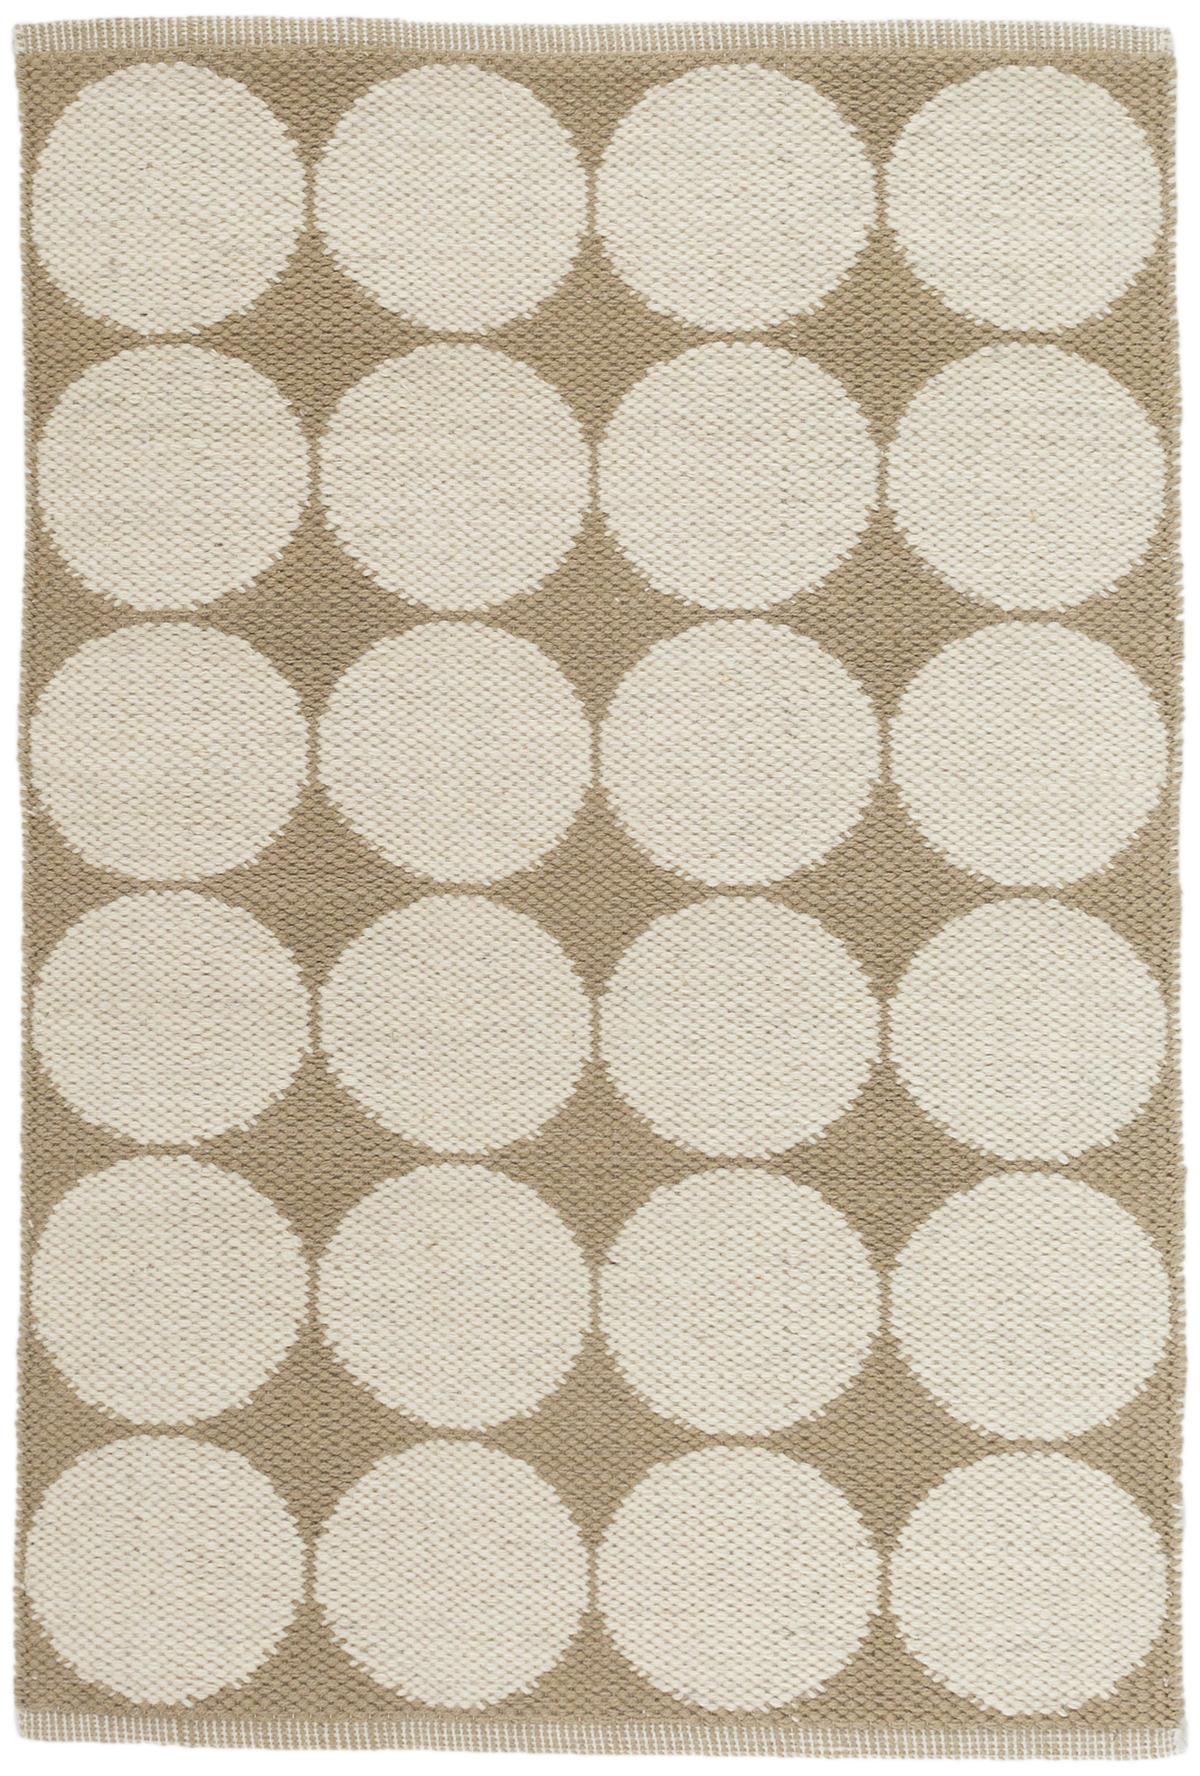 Orbit Natural Wool Woven Rug